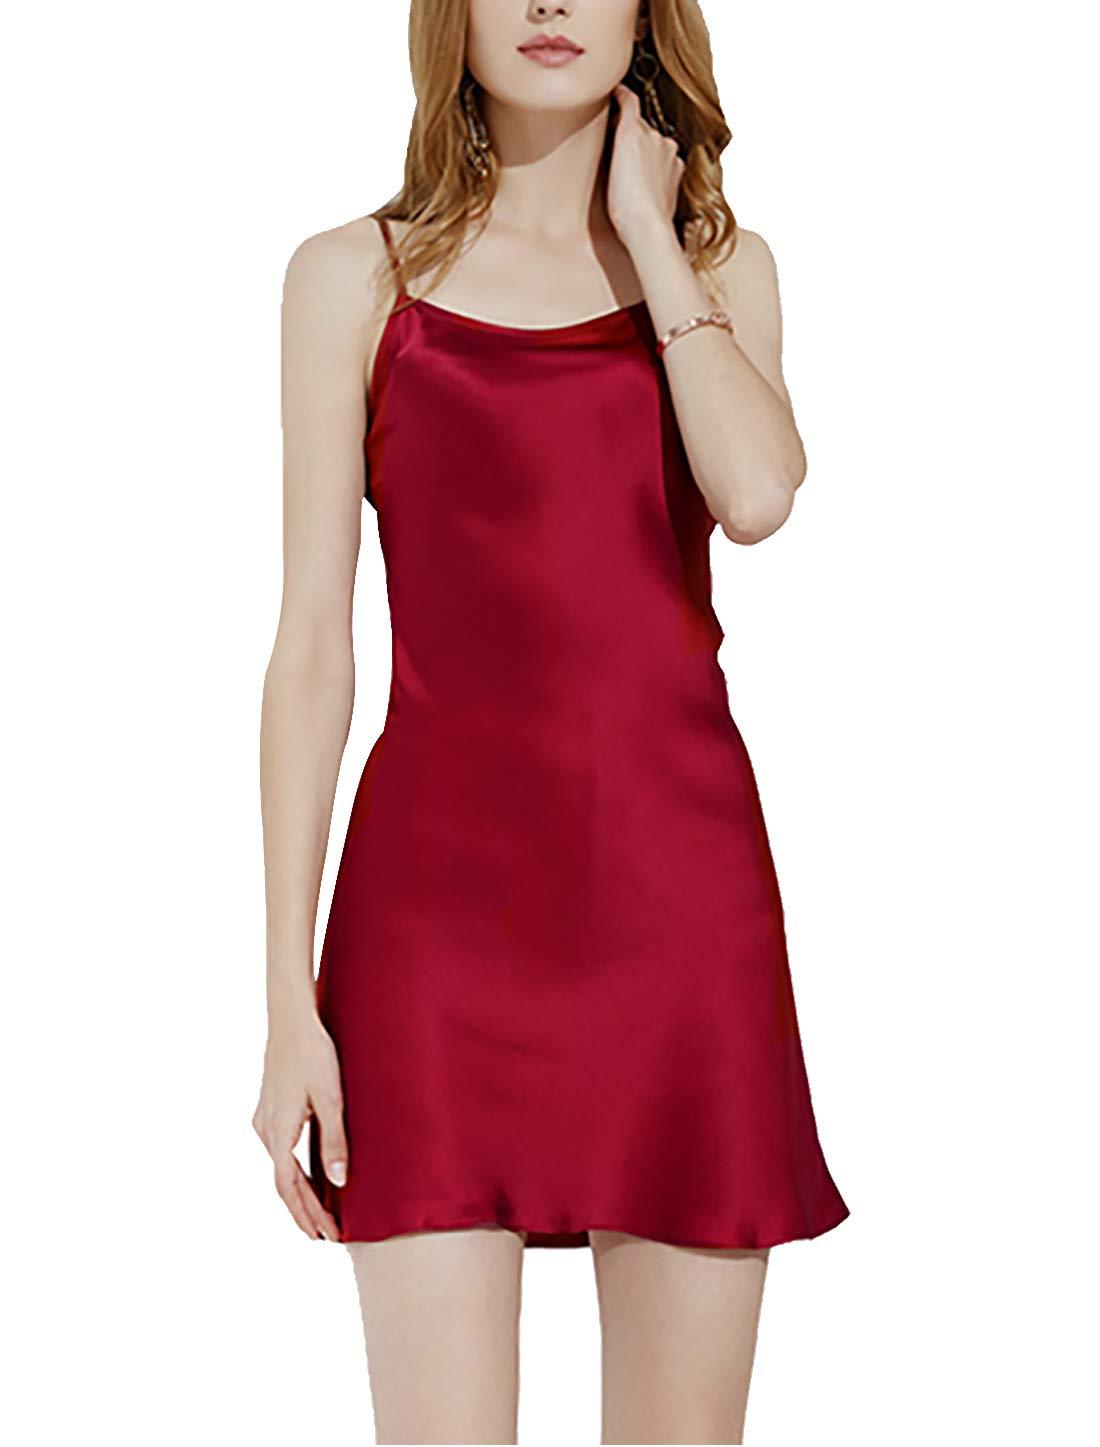 uxcell Big Full Slip Sleepwear Lotus Leaf Hem Basic Dress Camisole